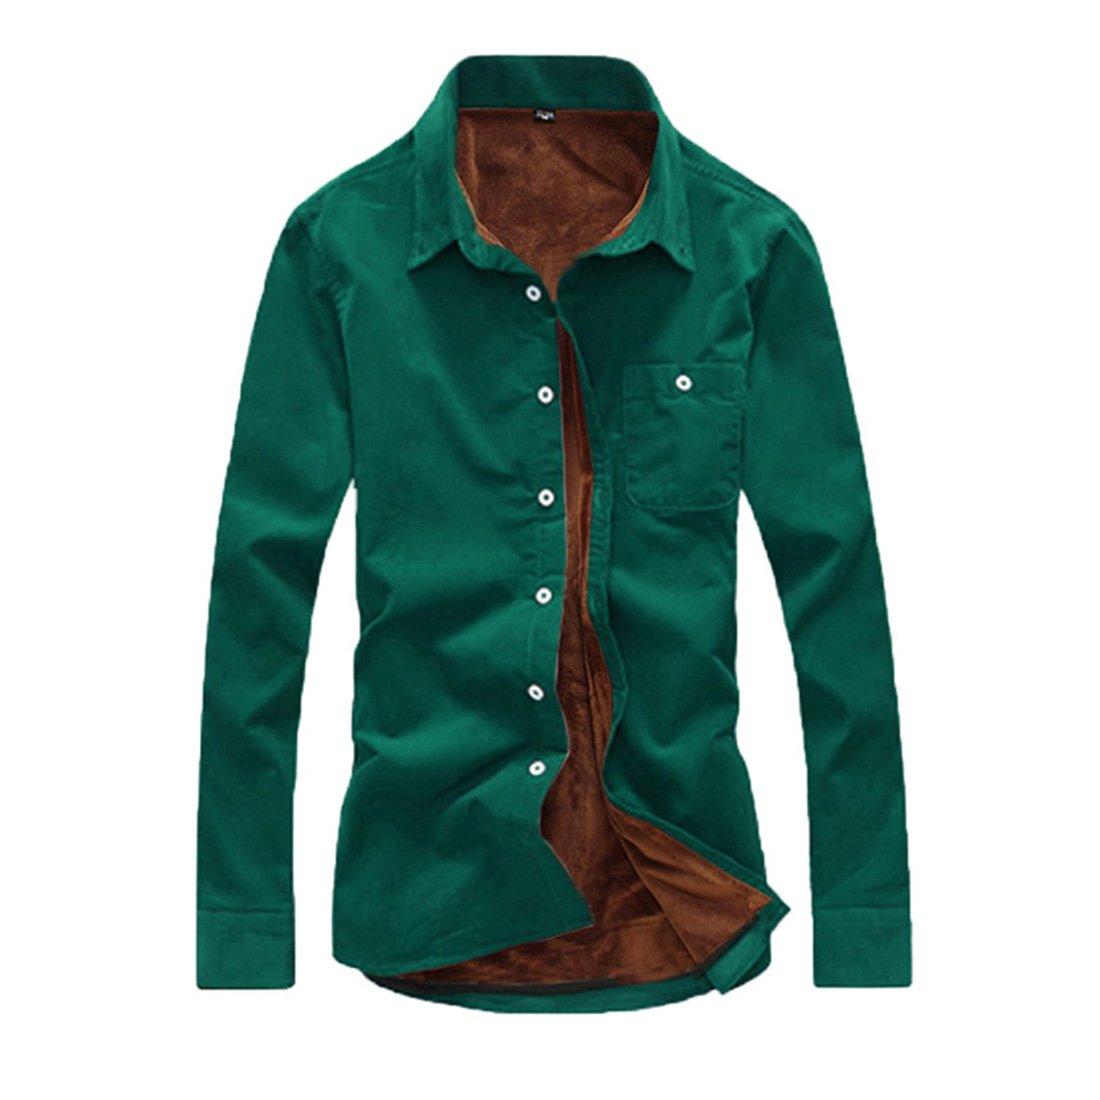 JTENGYAO Men's Trench Shirt Slim Fit Winter Warm Coat